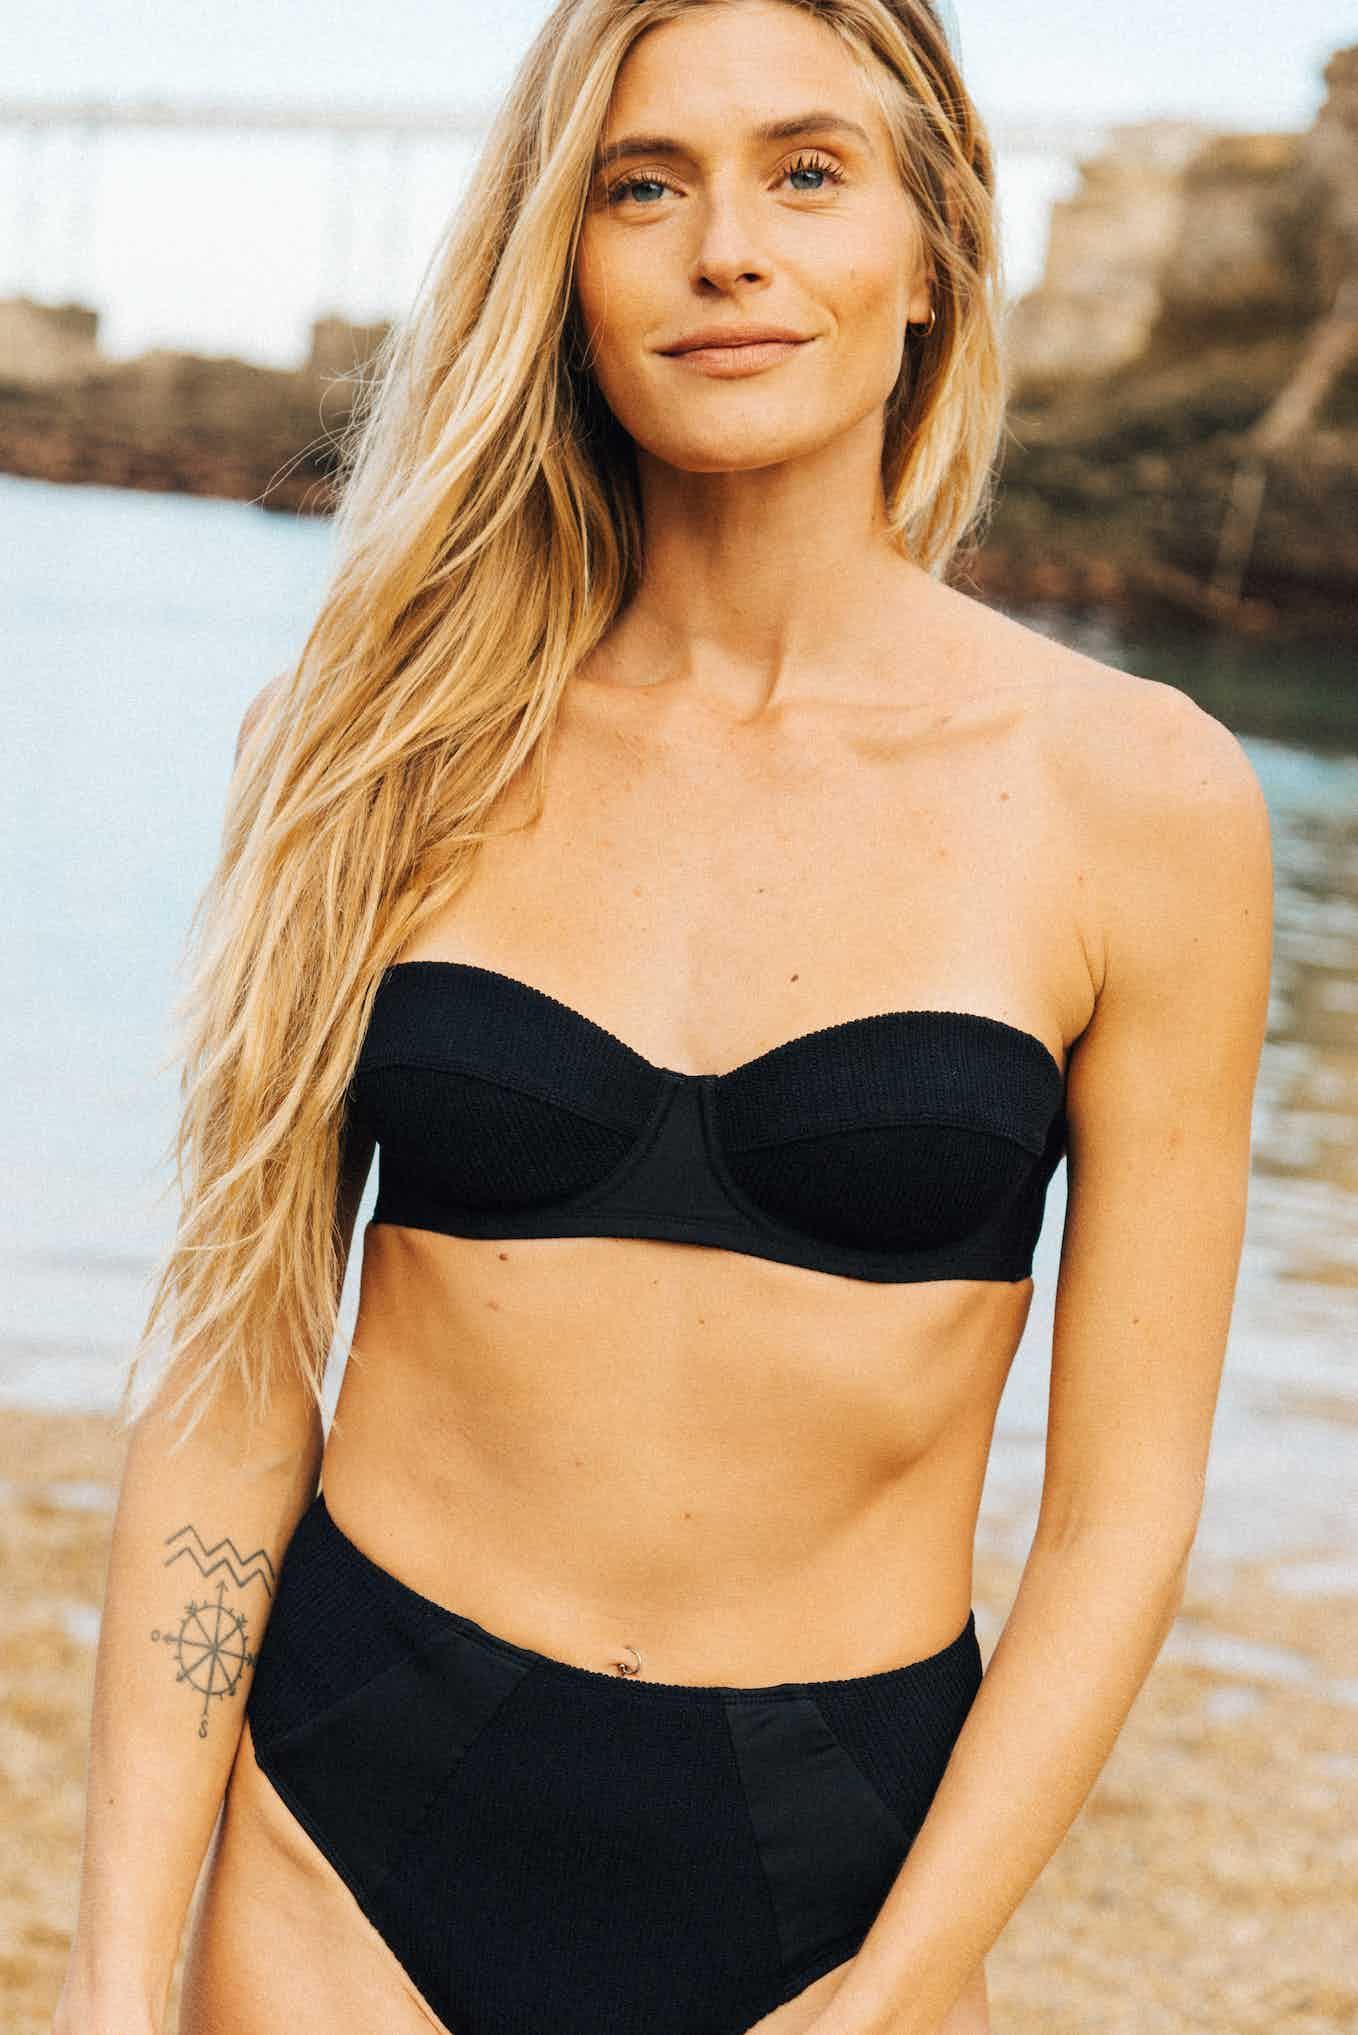 Bikini Soleil brûlant in black